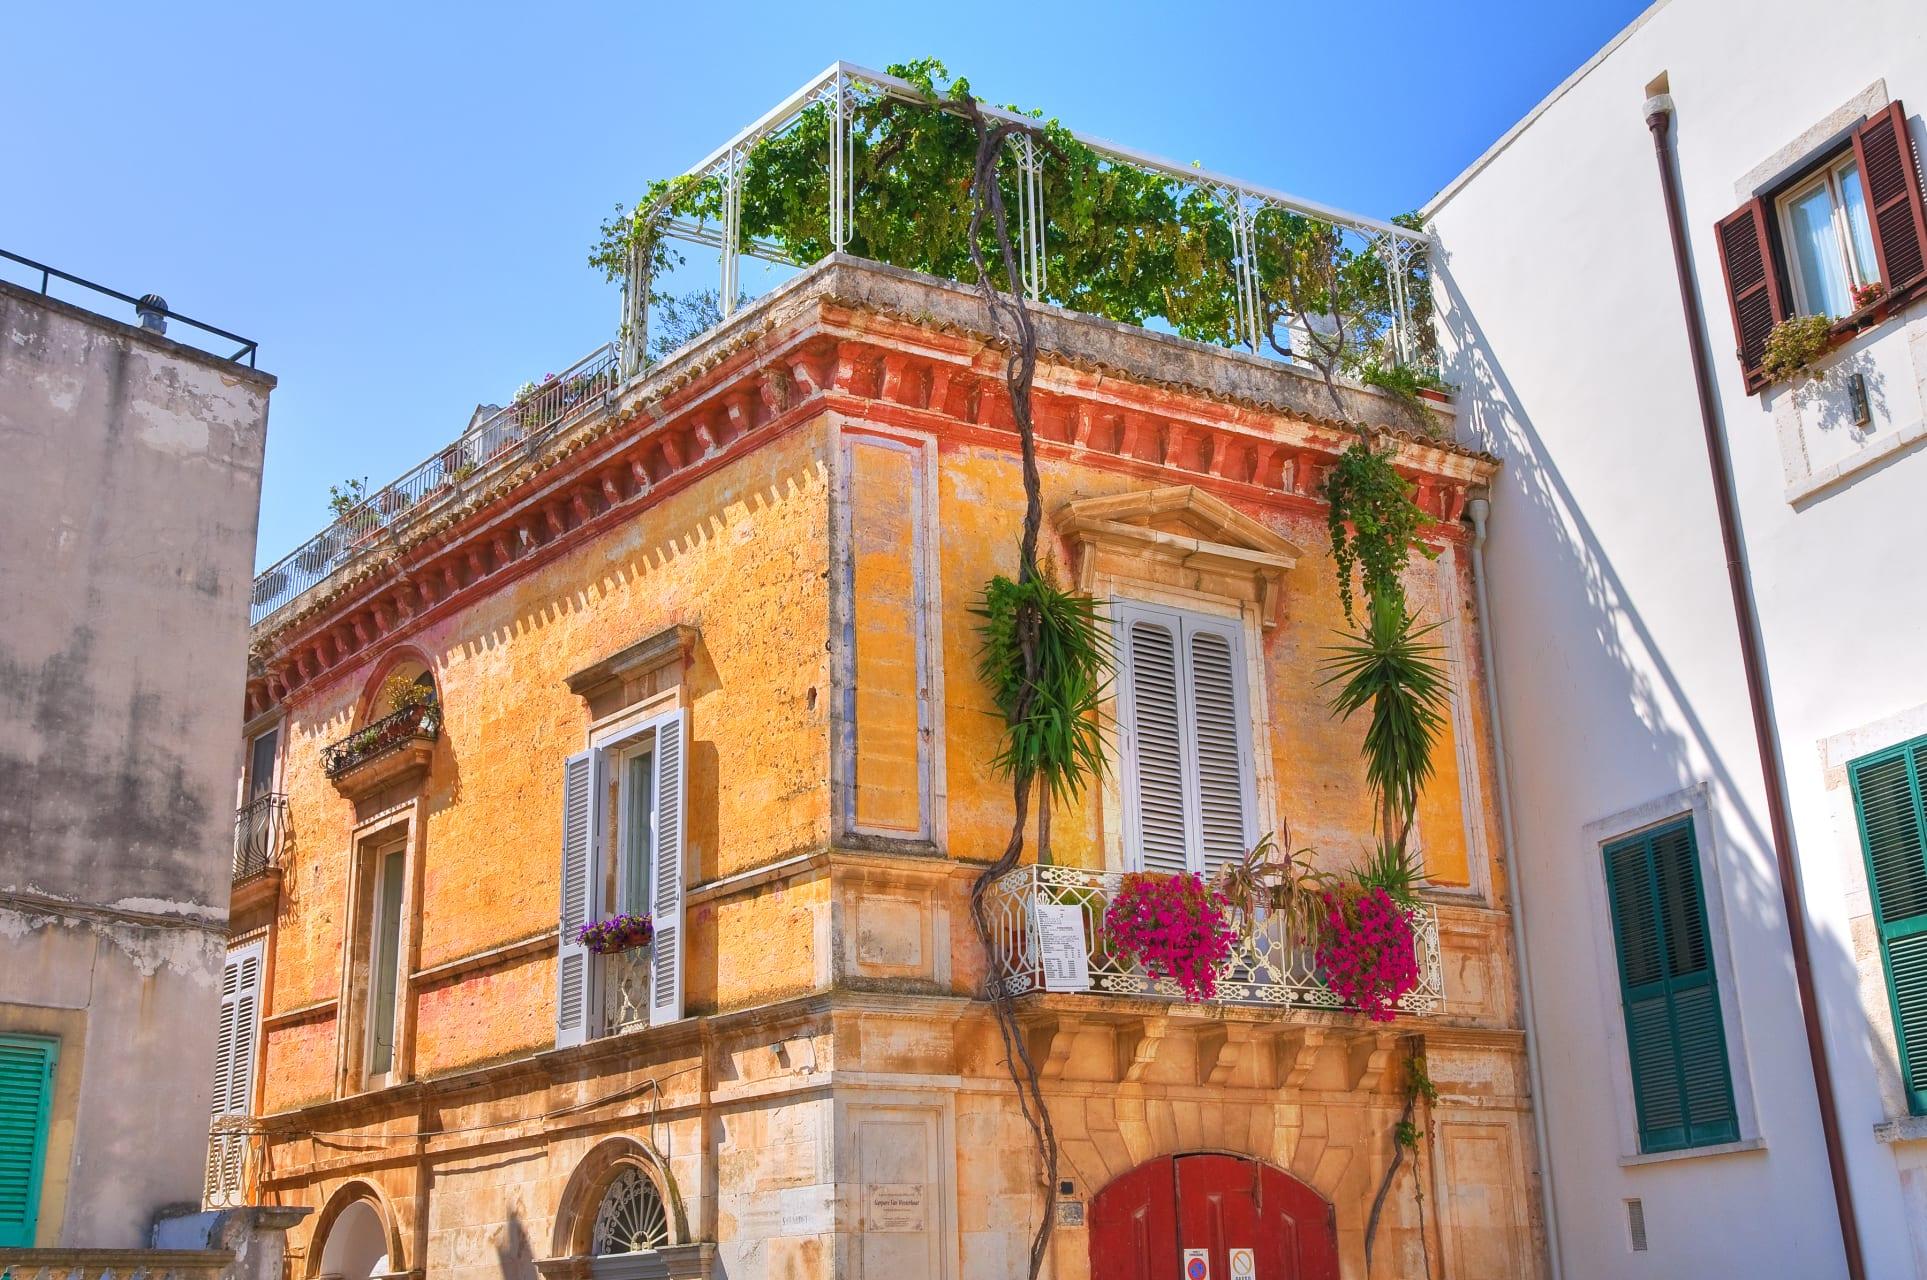 Puglia - Conversano: An ancient beautiful town that flies under the radar